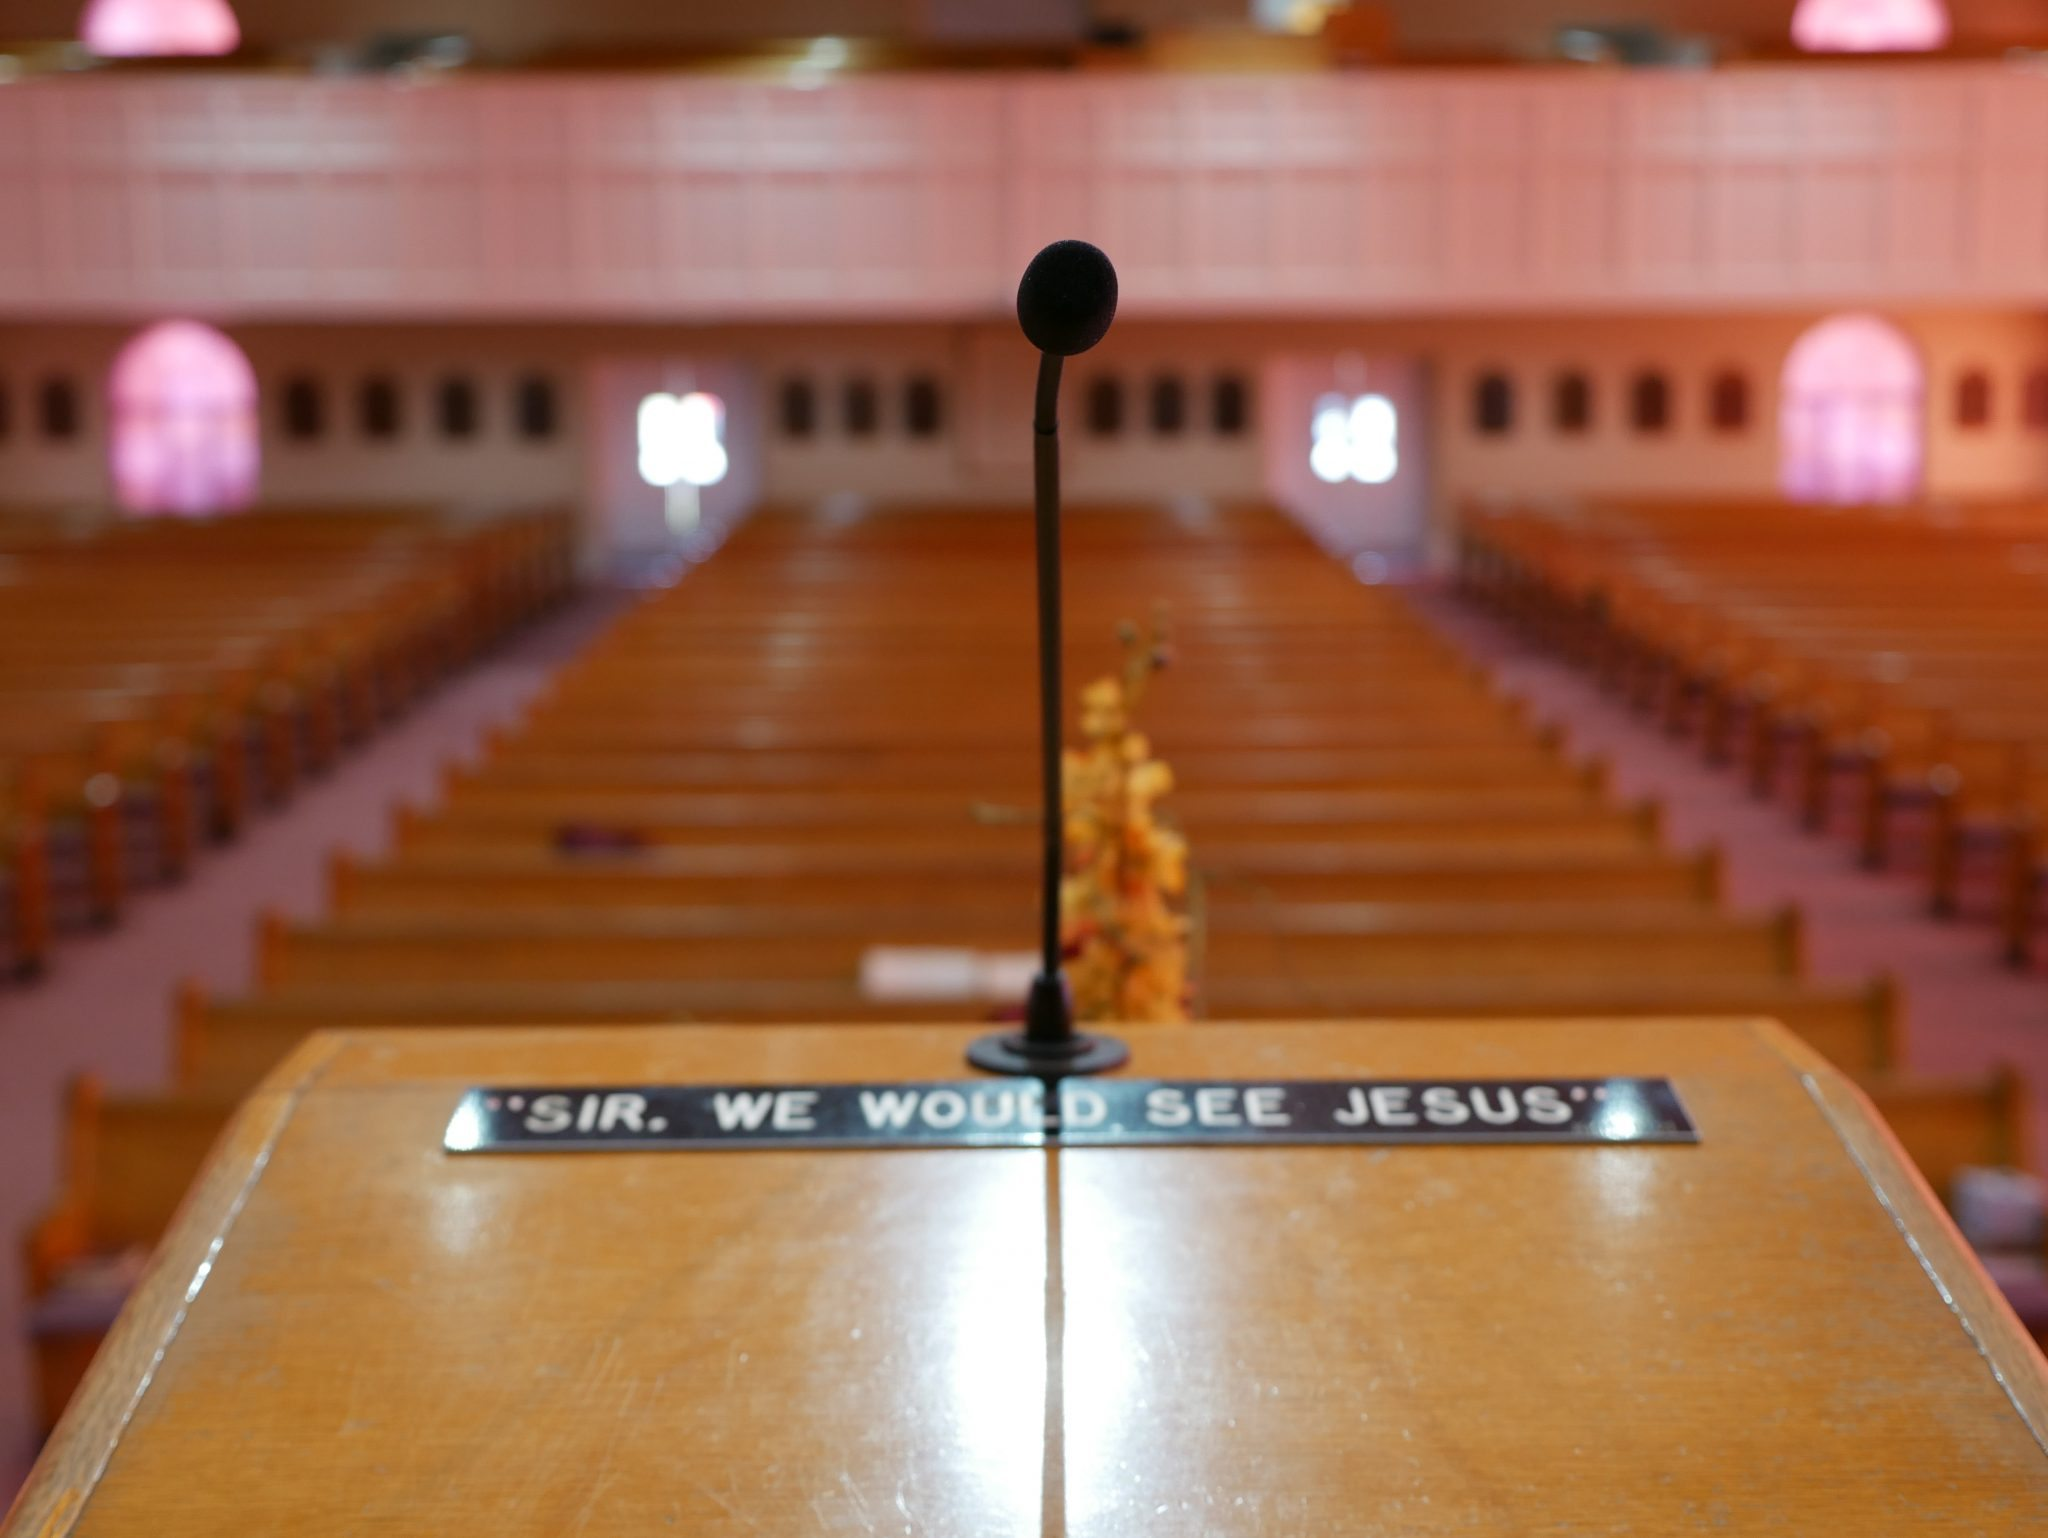 Sermons on Demand